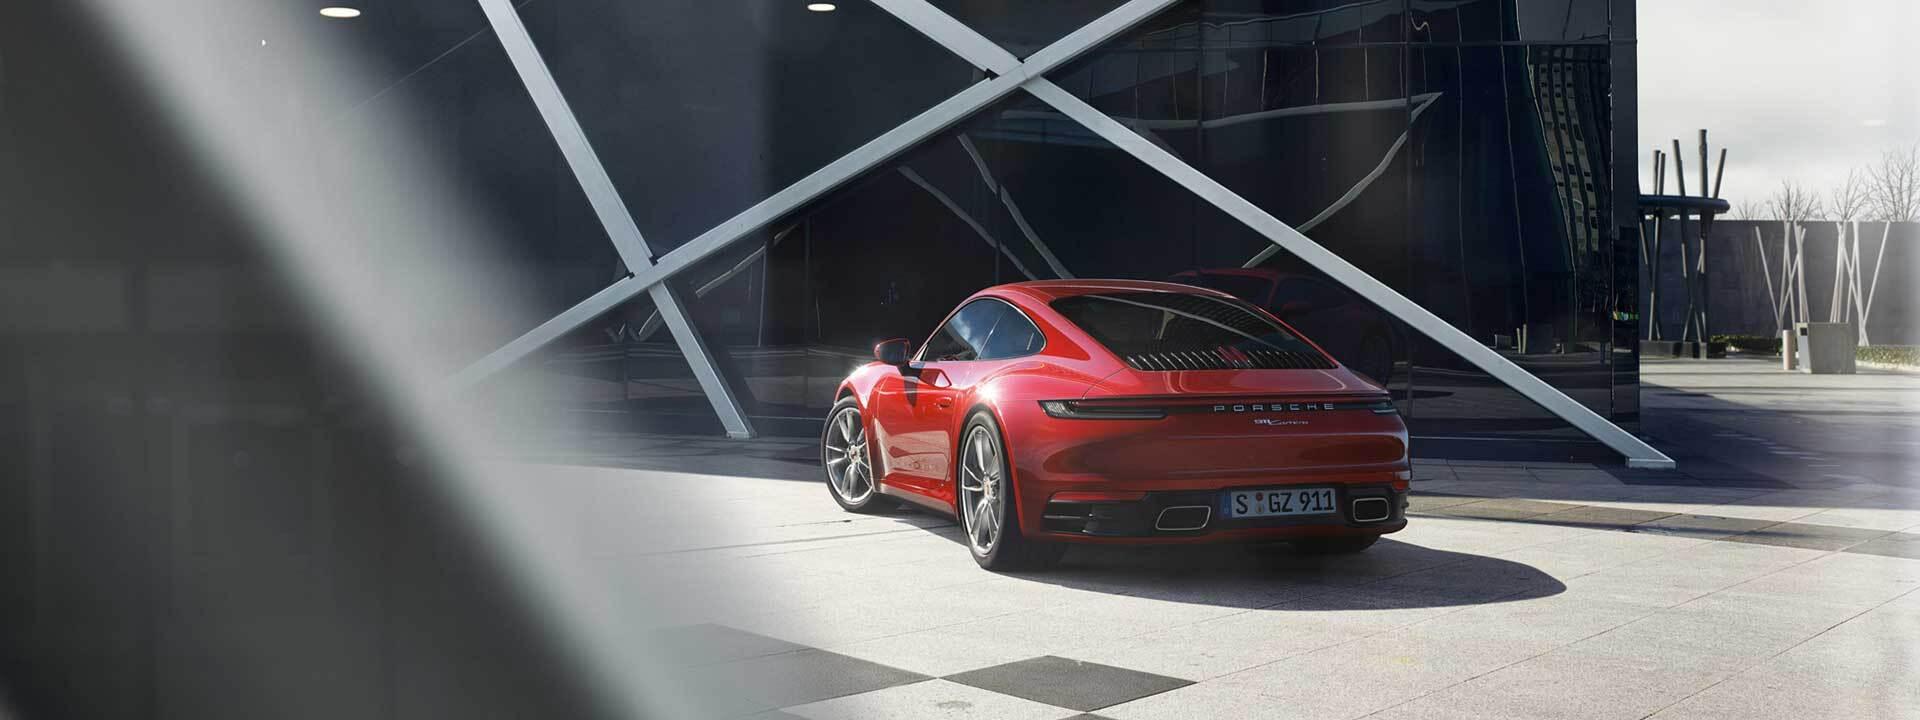 A Porsche parked in Newark, DE